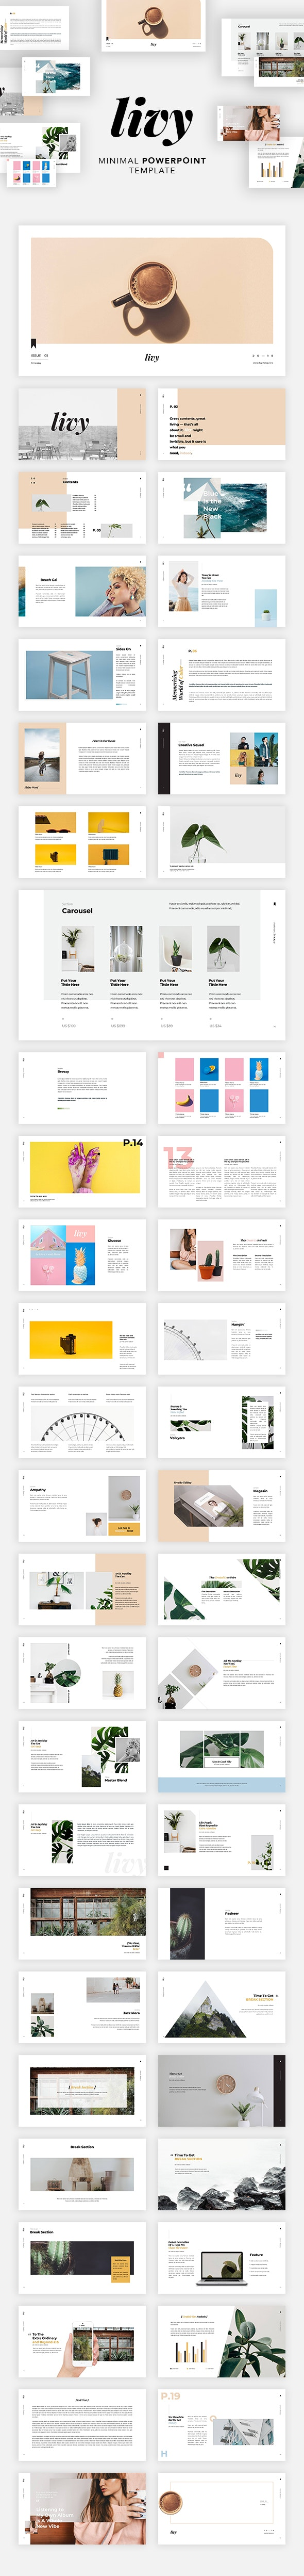 Livy Powerpoint - Creative PowerPoint Templates